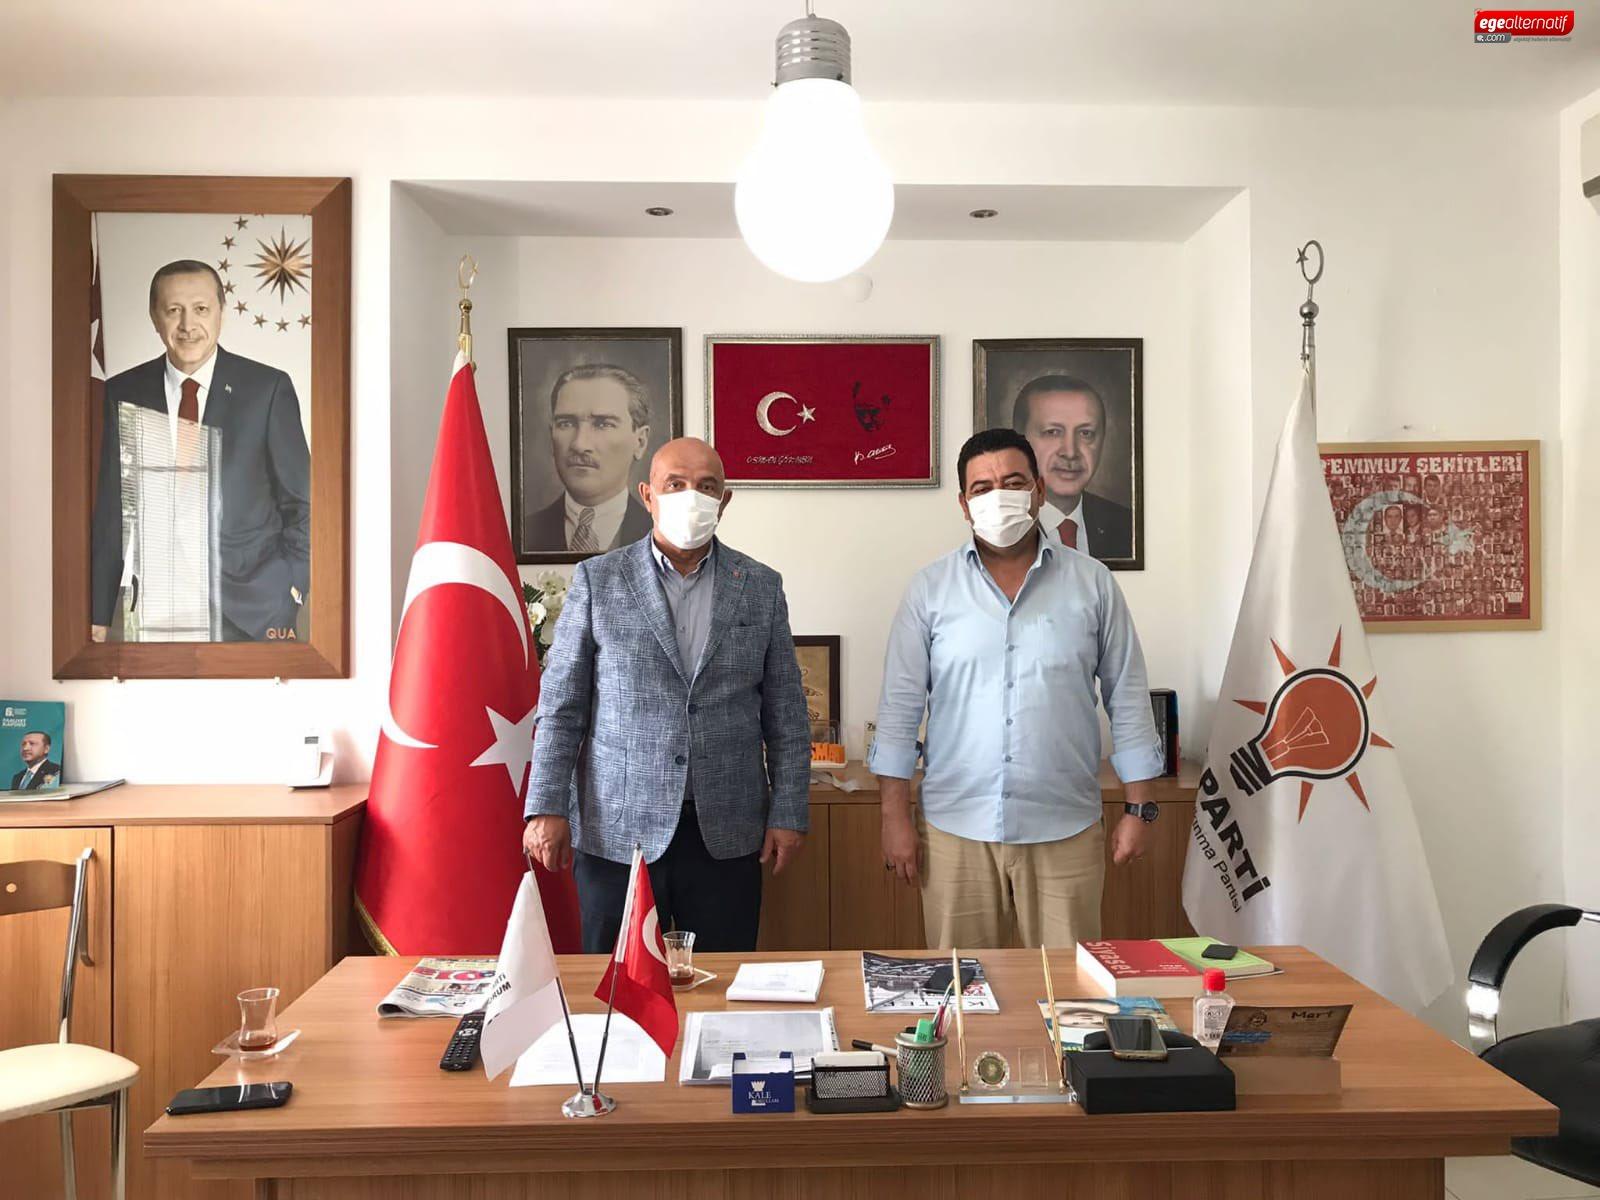 AK Partili Eski Vekil CHP'li Belediyeye Danışmanlık Yapacak